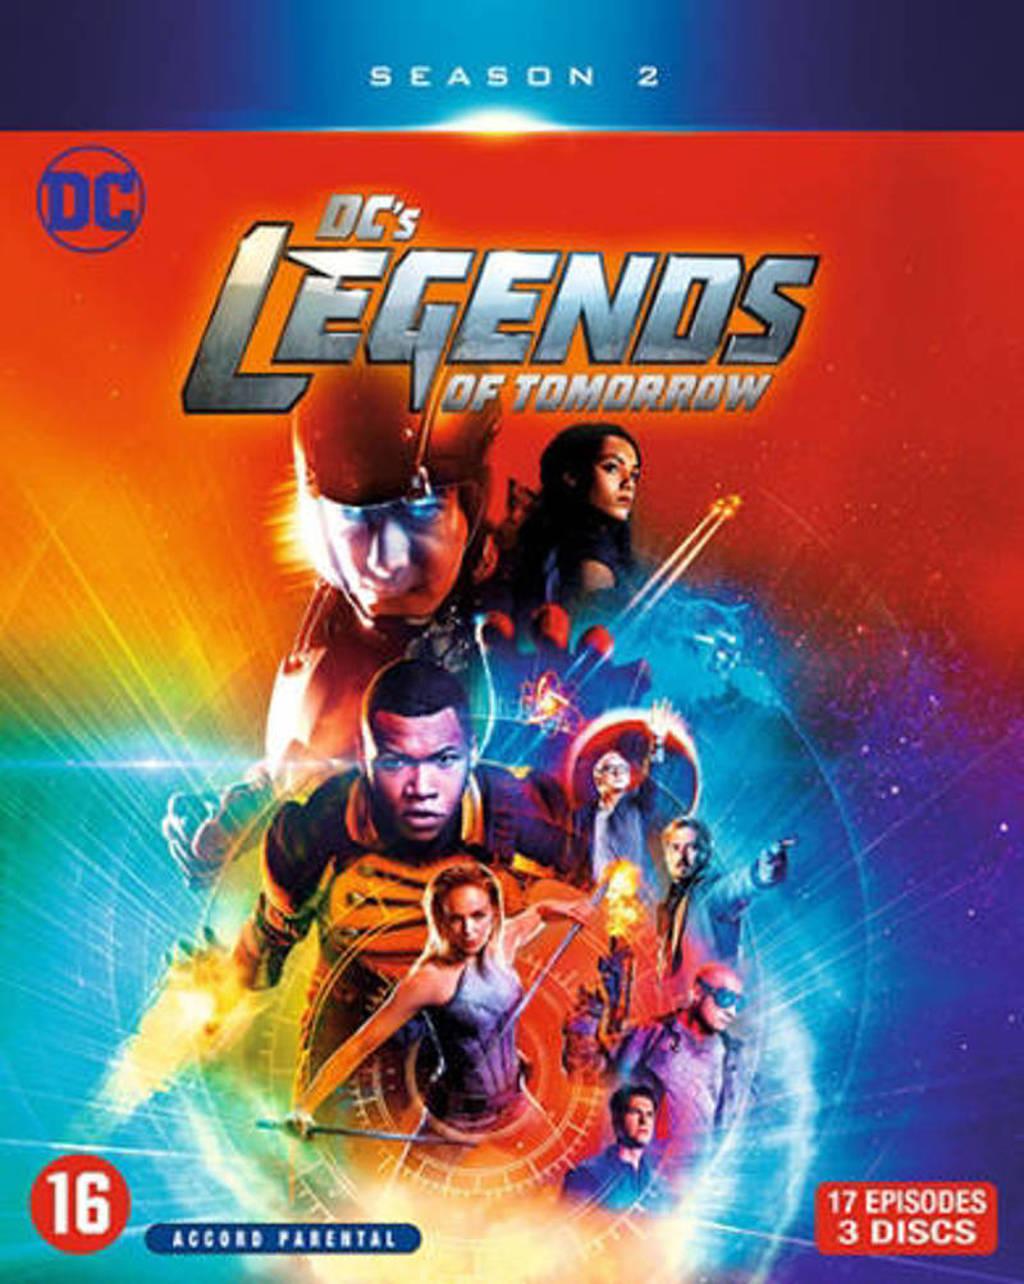 Legends of tomorrow - Seizoen 2  (Blu-ray)